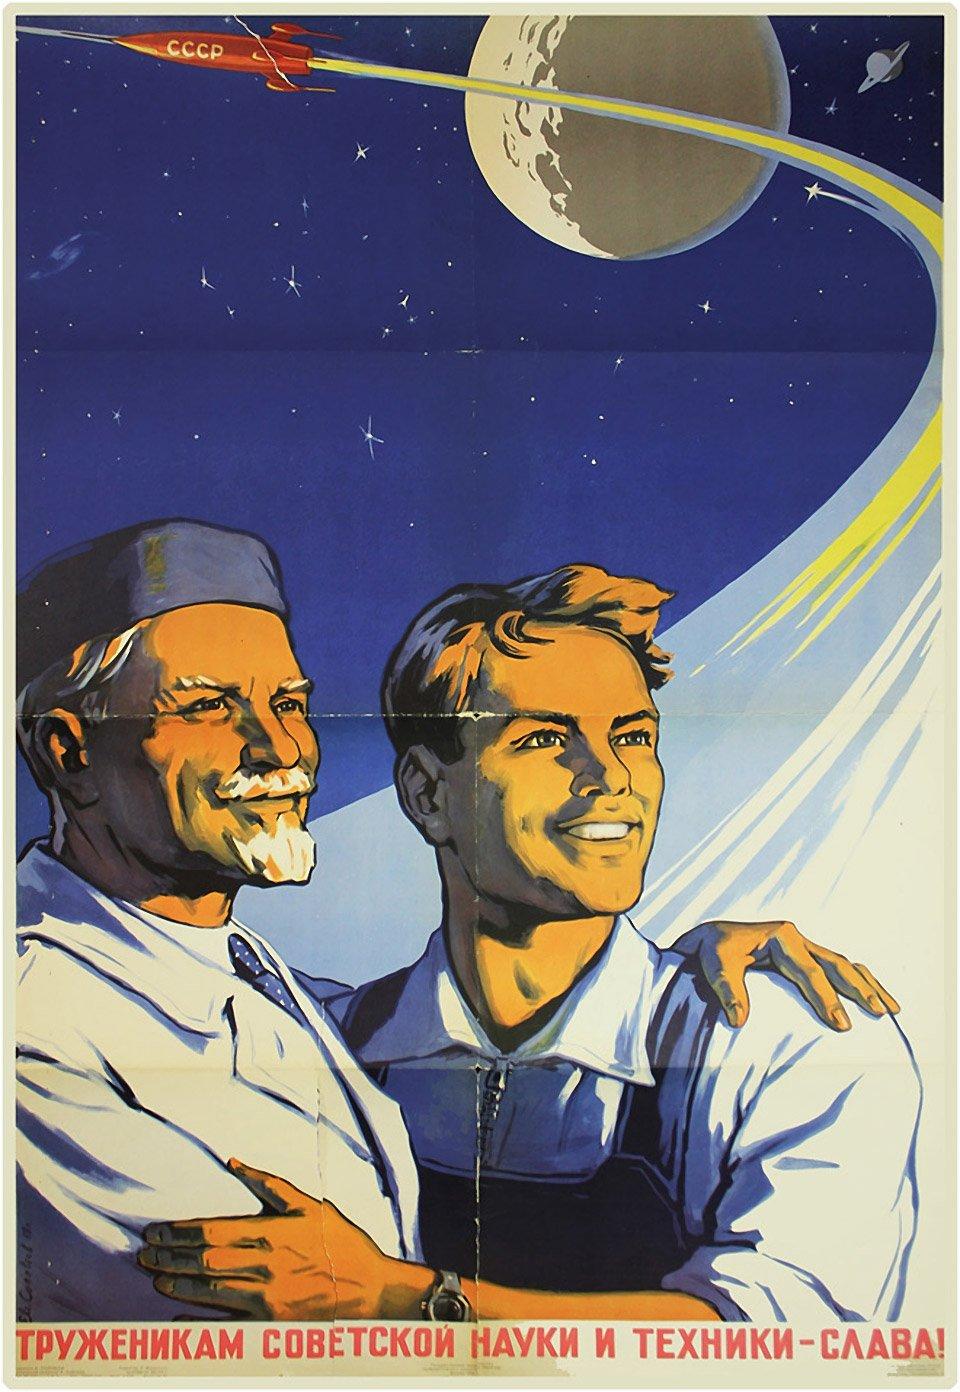 Classic Soviet-Era Space Propaganda Posters